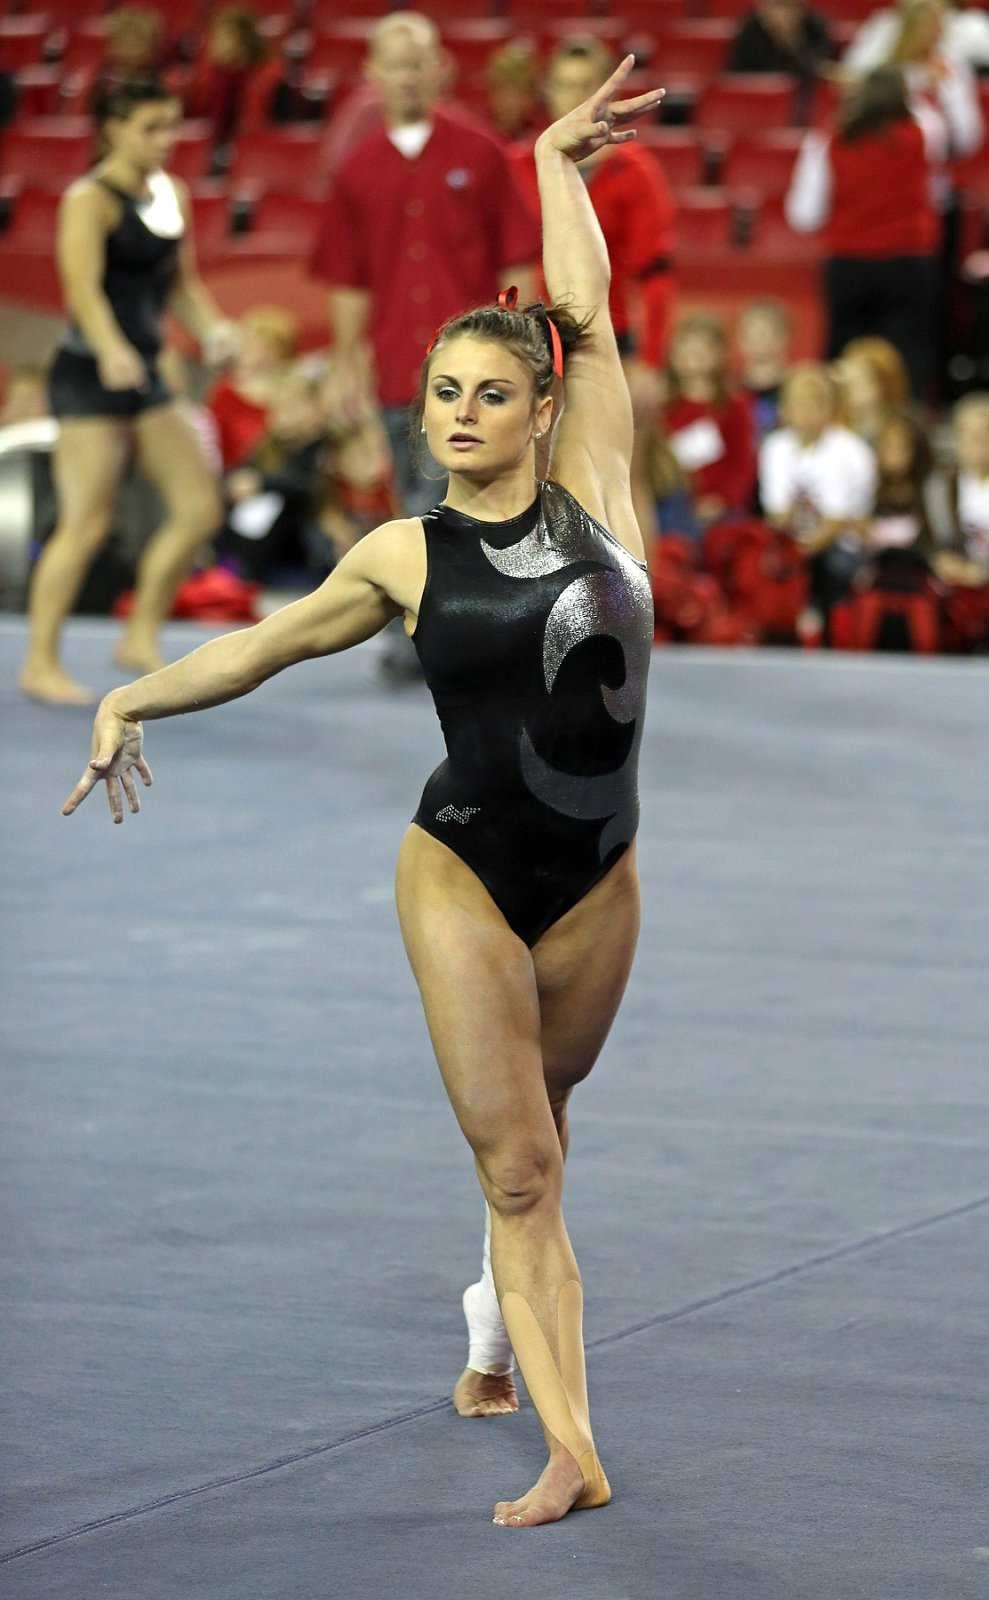 Gymnast Nude with regard to gymnast, larisa iordache   leaked celebs   pinterest   gymnasts